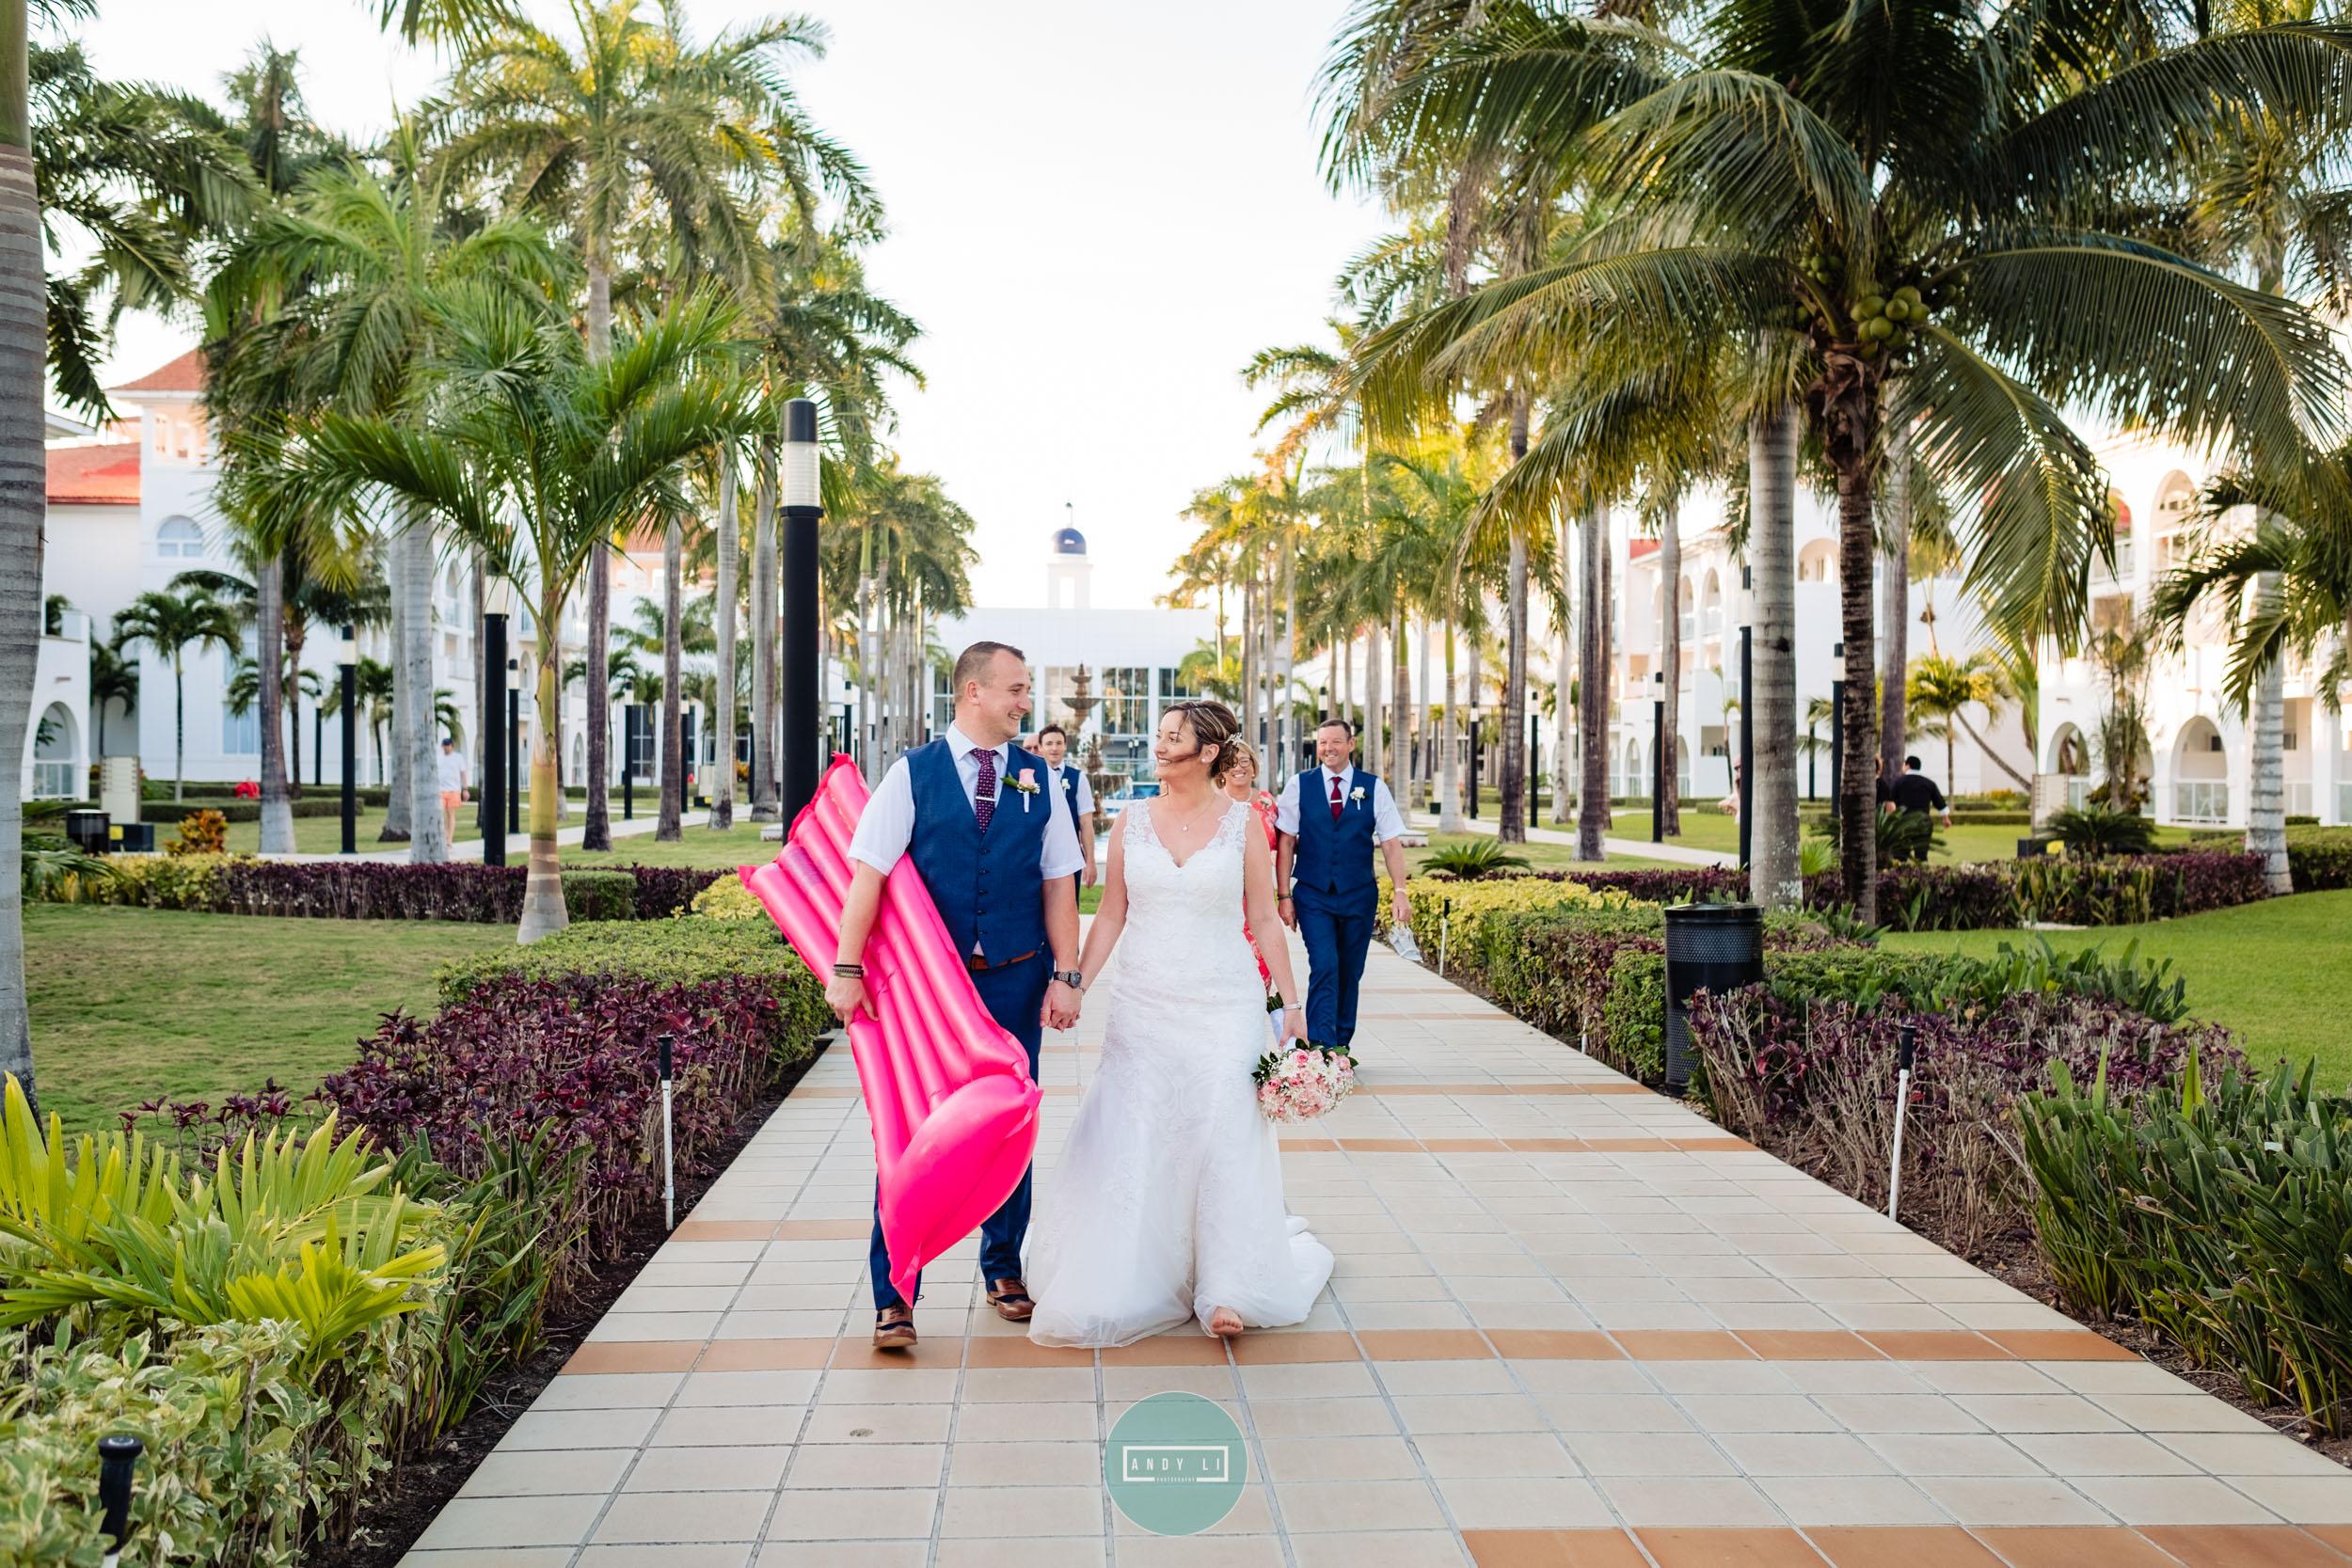 Playa del Carmen Mexico Wedding Photography-036-AXT22762.jpg